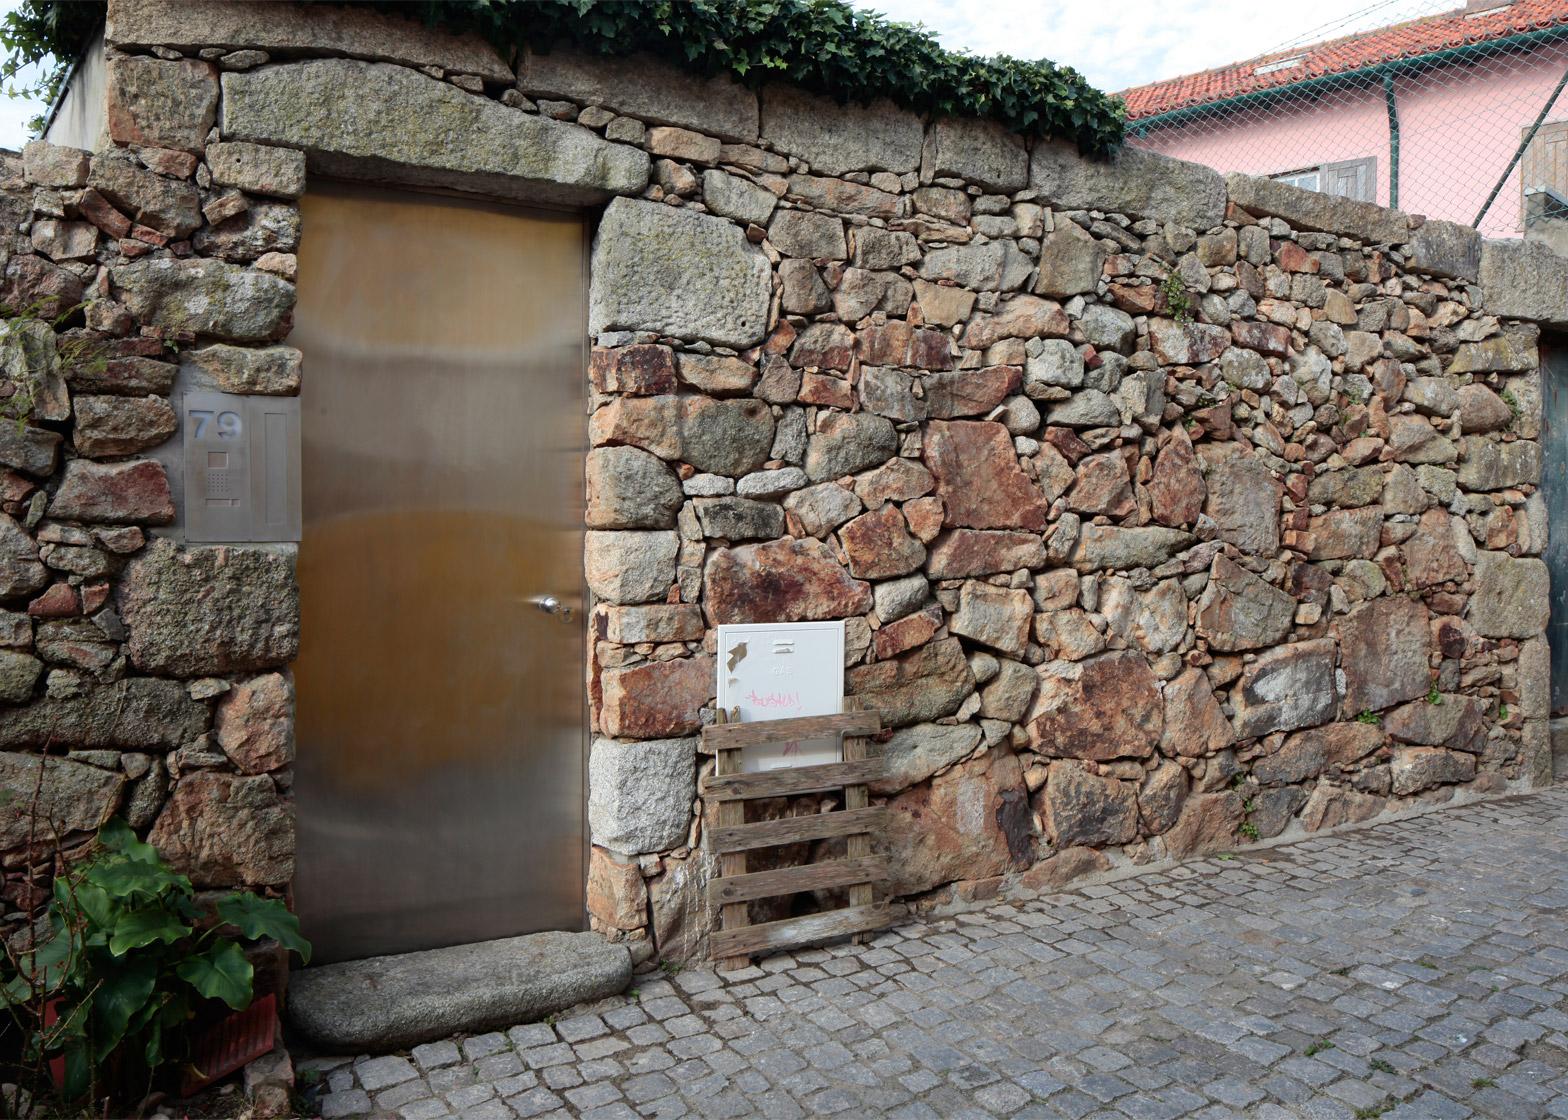 Architecture-courtyard-design-studia-interiors-osnovadesign-osnova-poltava-16